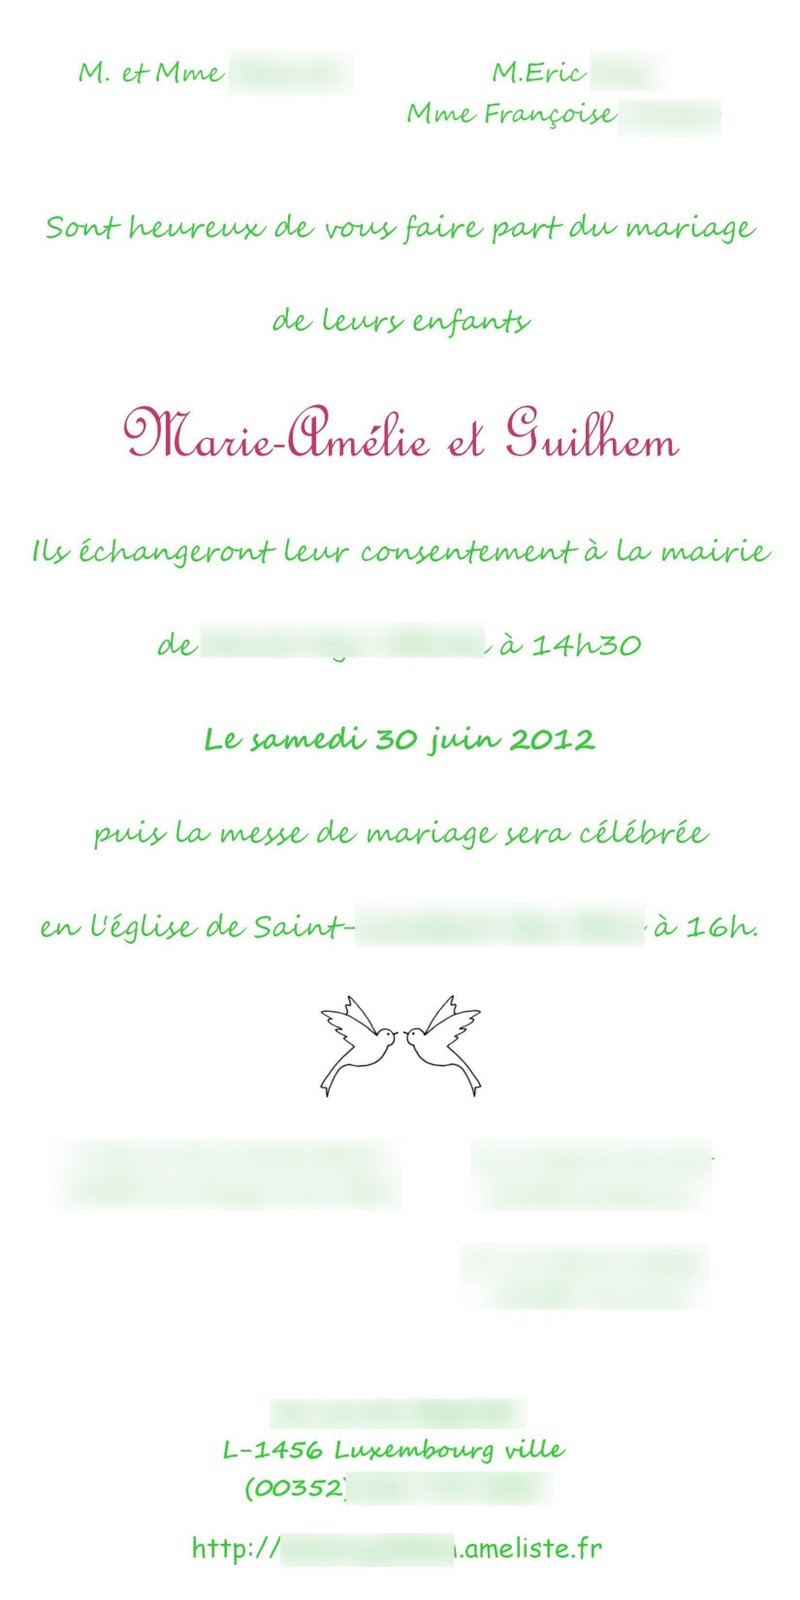 Angeline melin mariage création faire part mariage